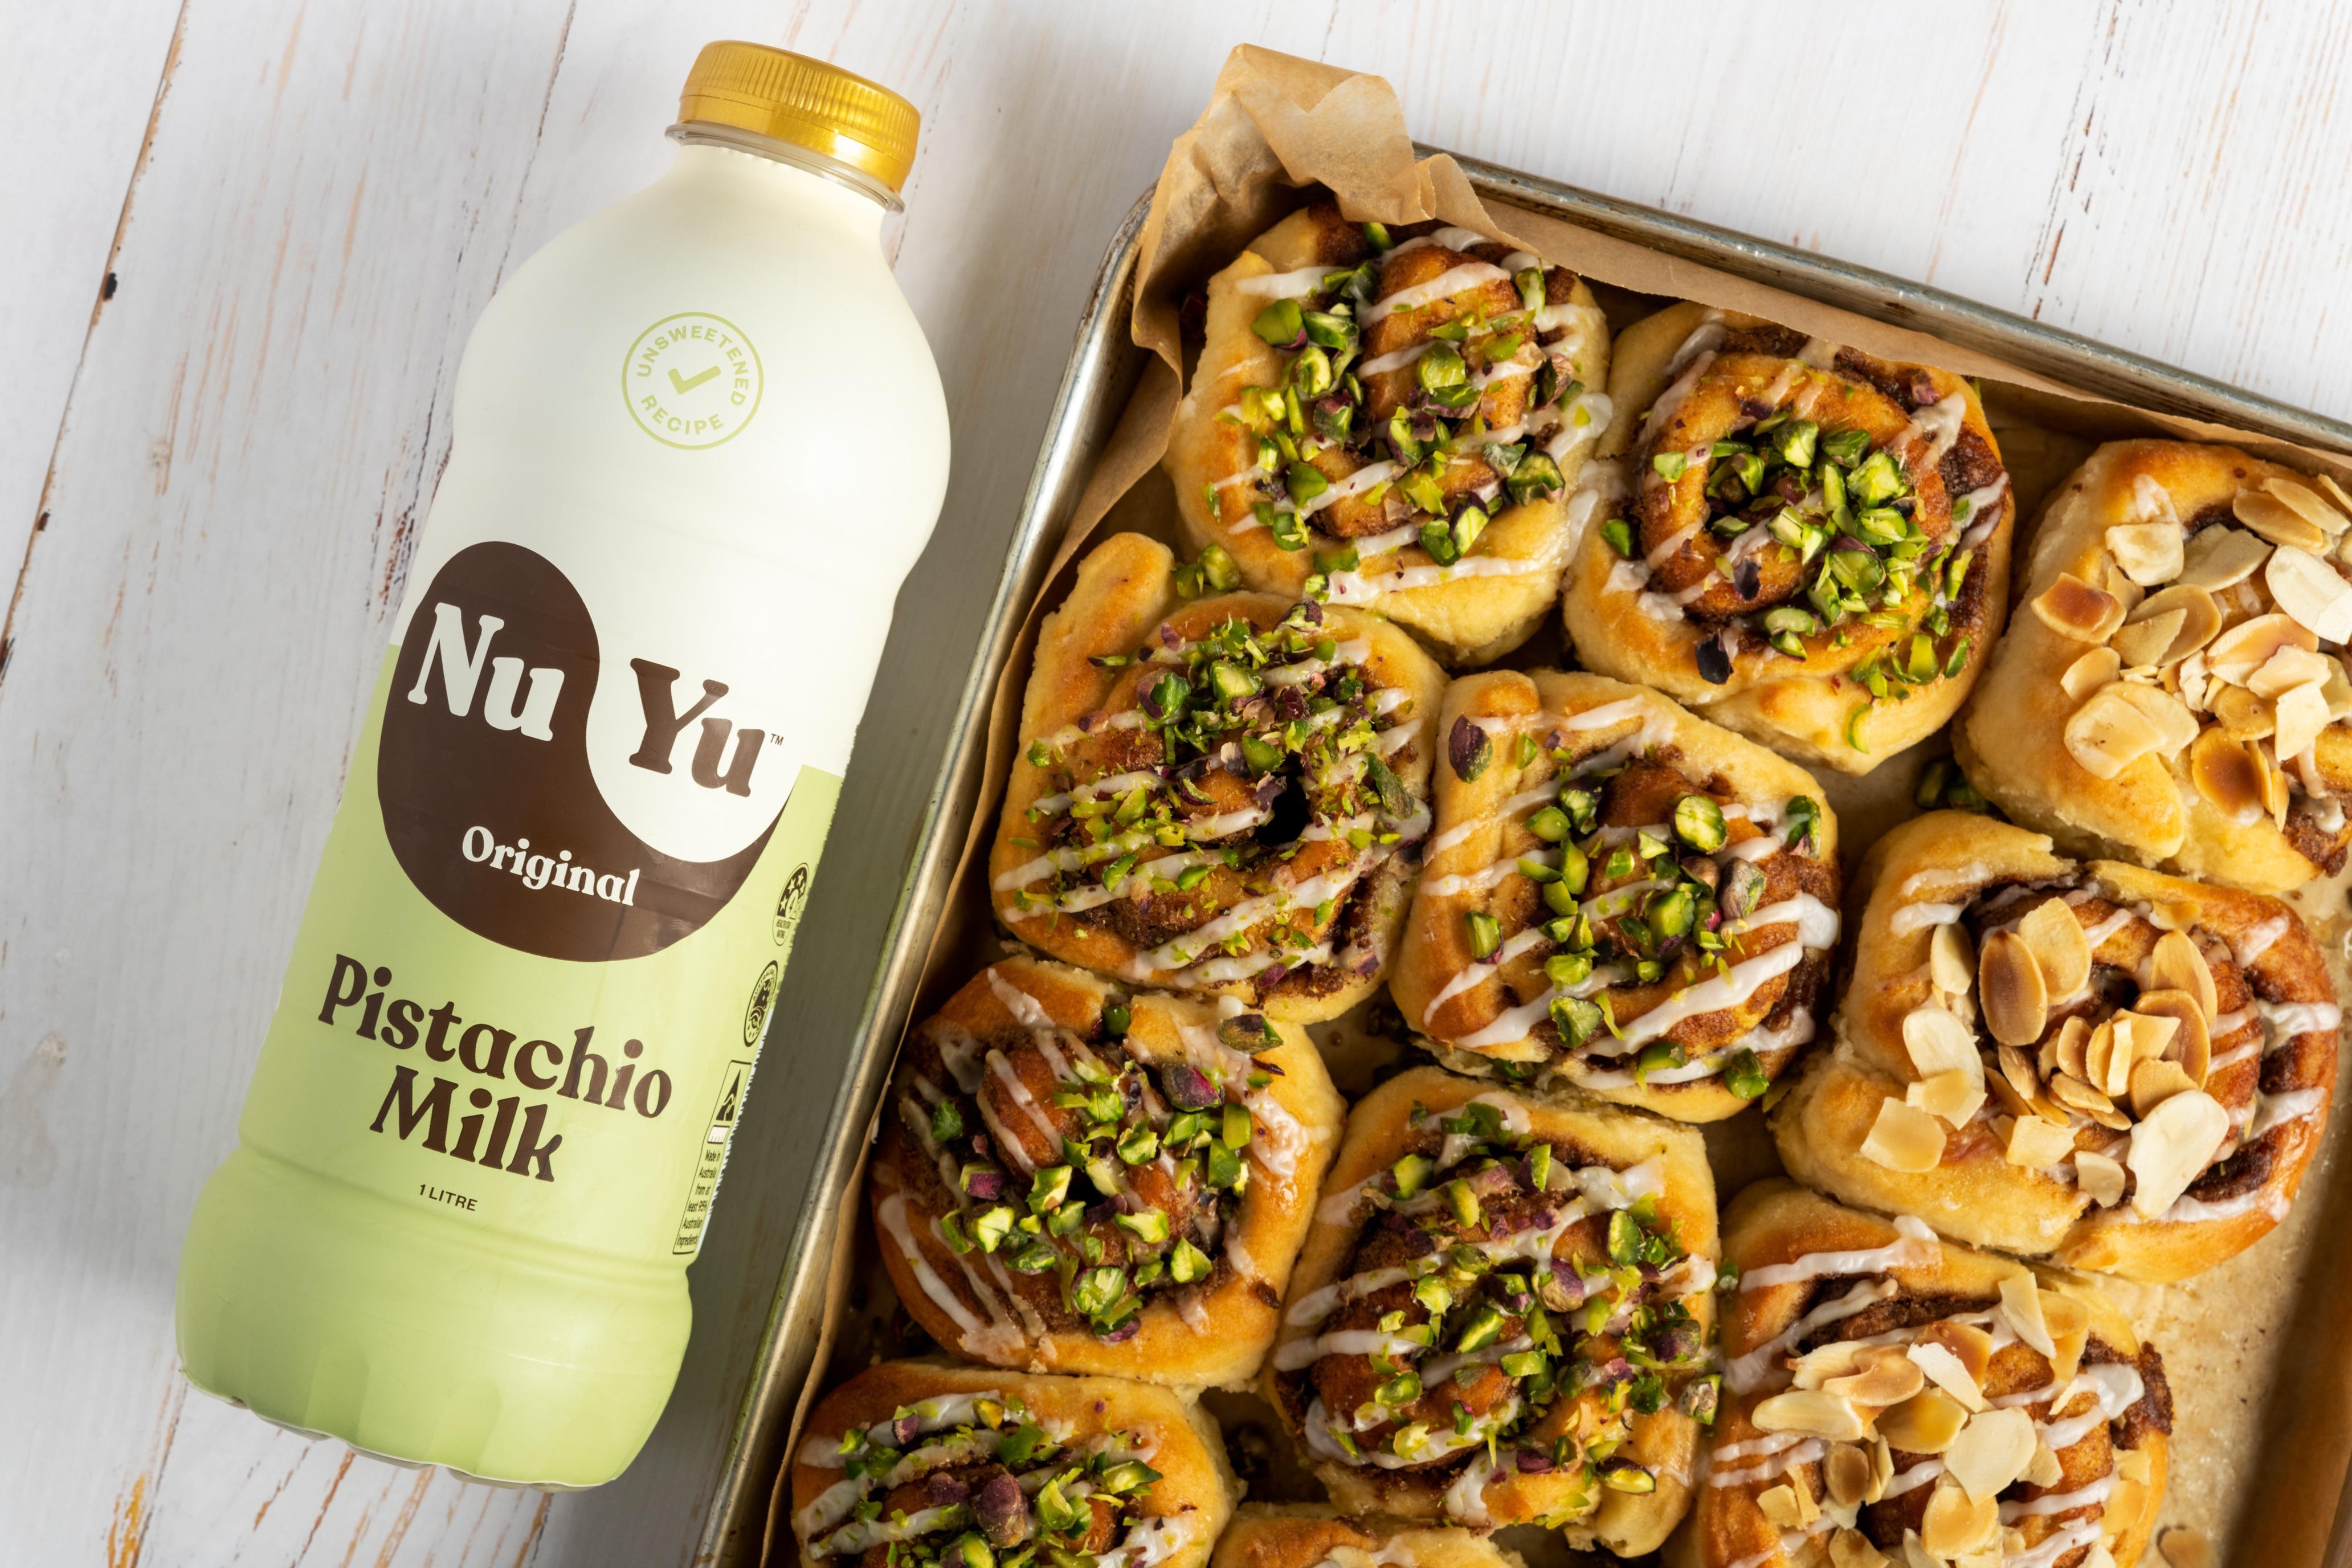 NUYU launch new plant based milk